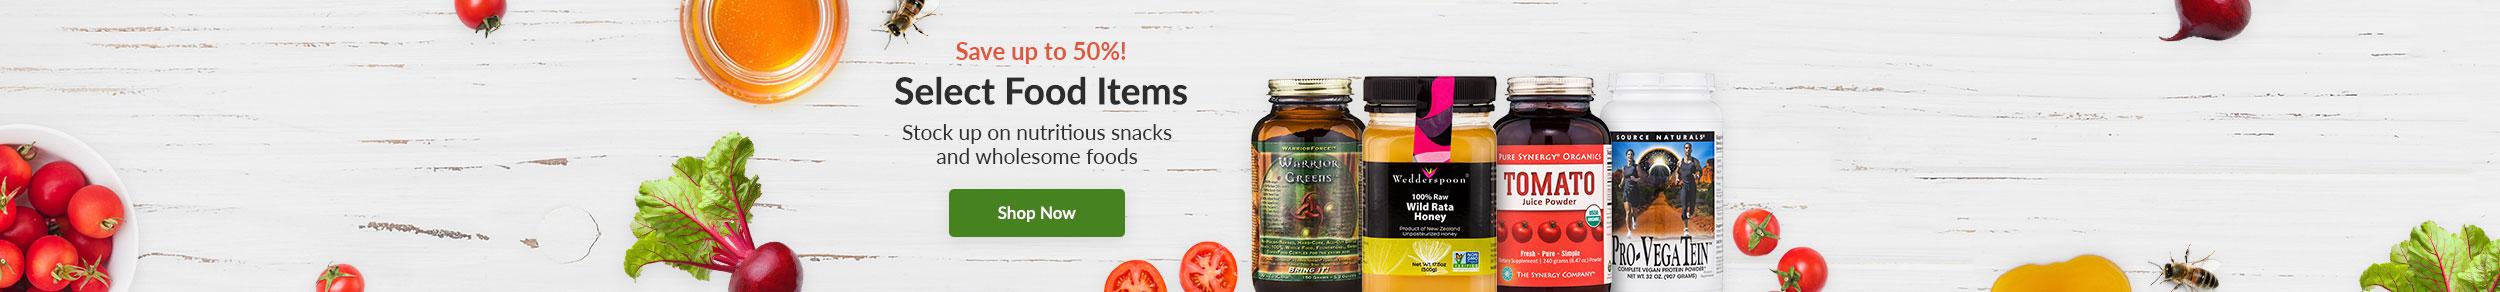 https://i3.pureformulas.net/images/static/On-Sale-Food-Items_122818.jpg